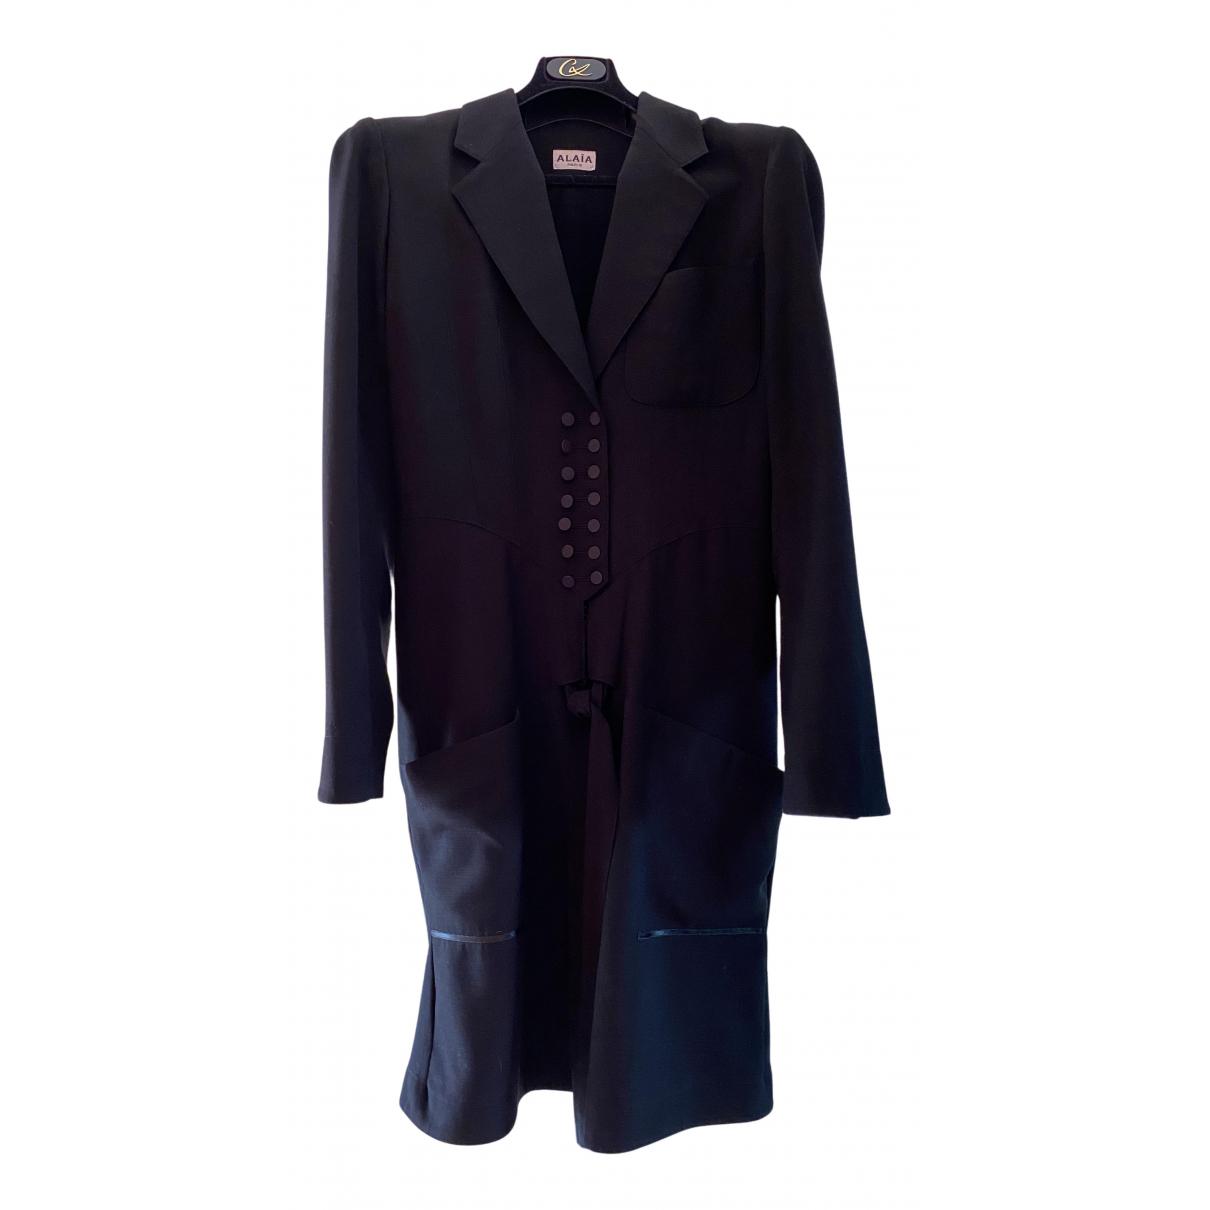 Alaïa N Black dress for Women 40 FR